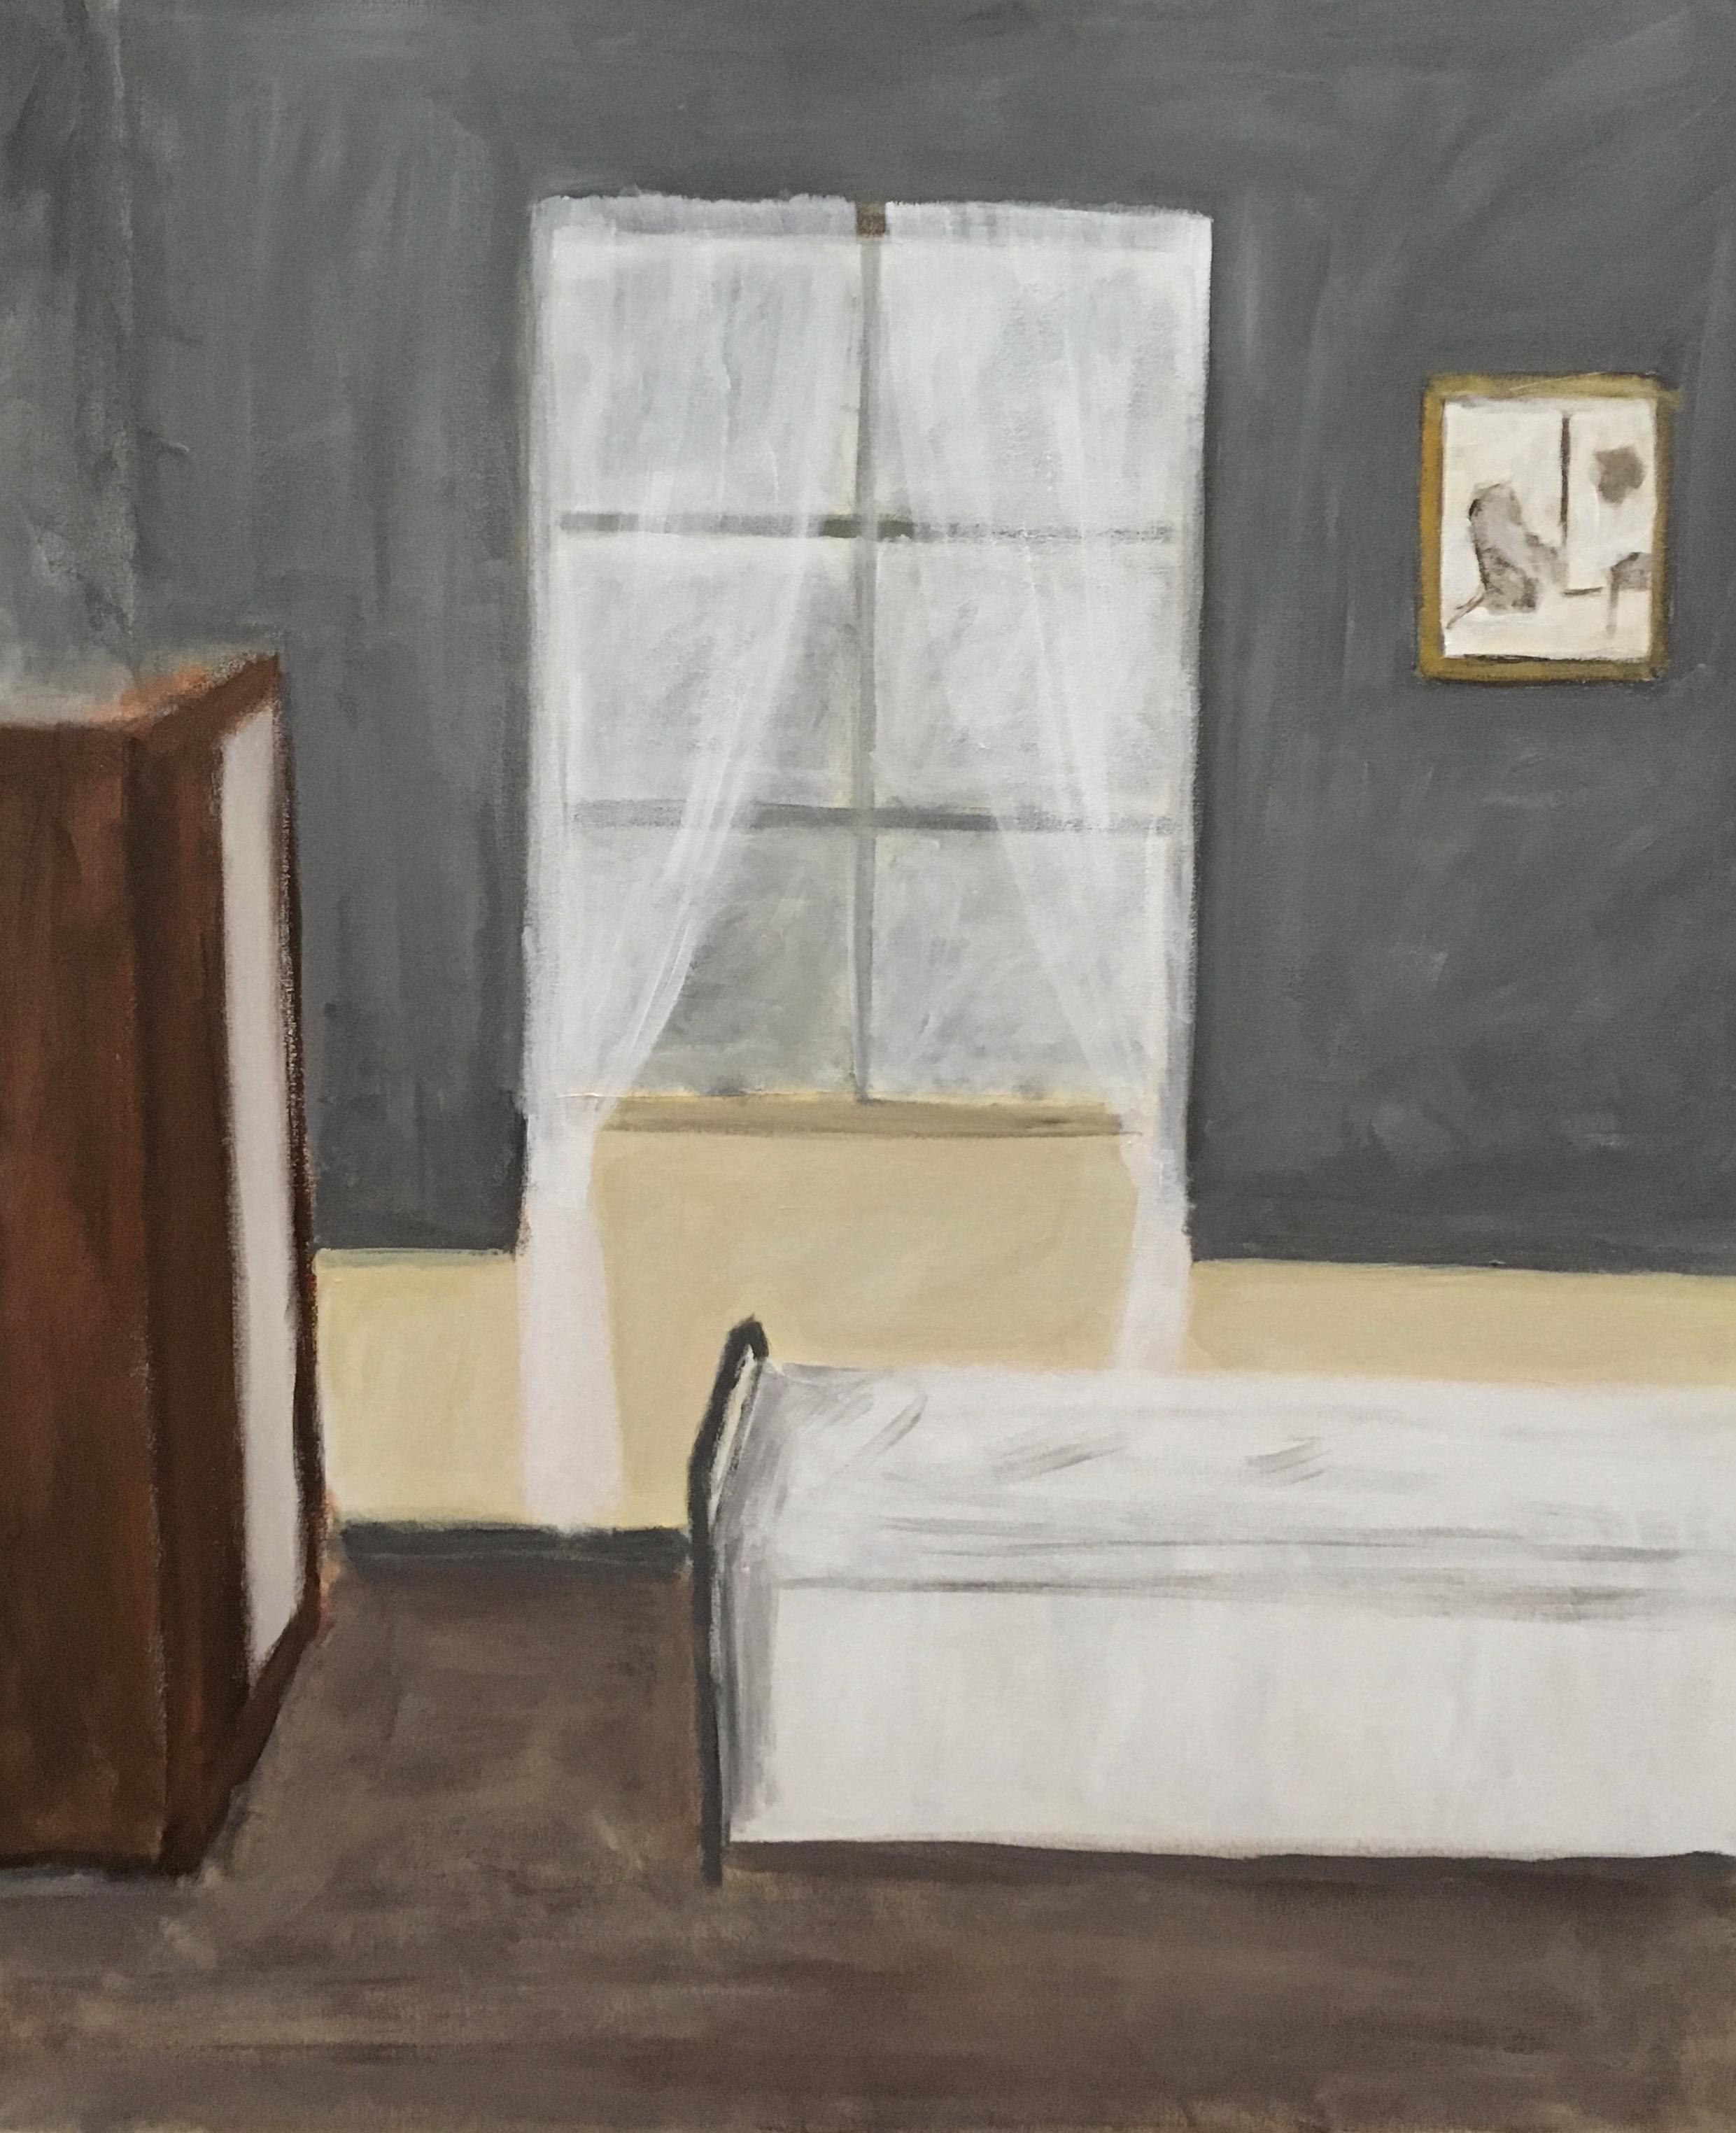 La cortina blanca